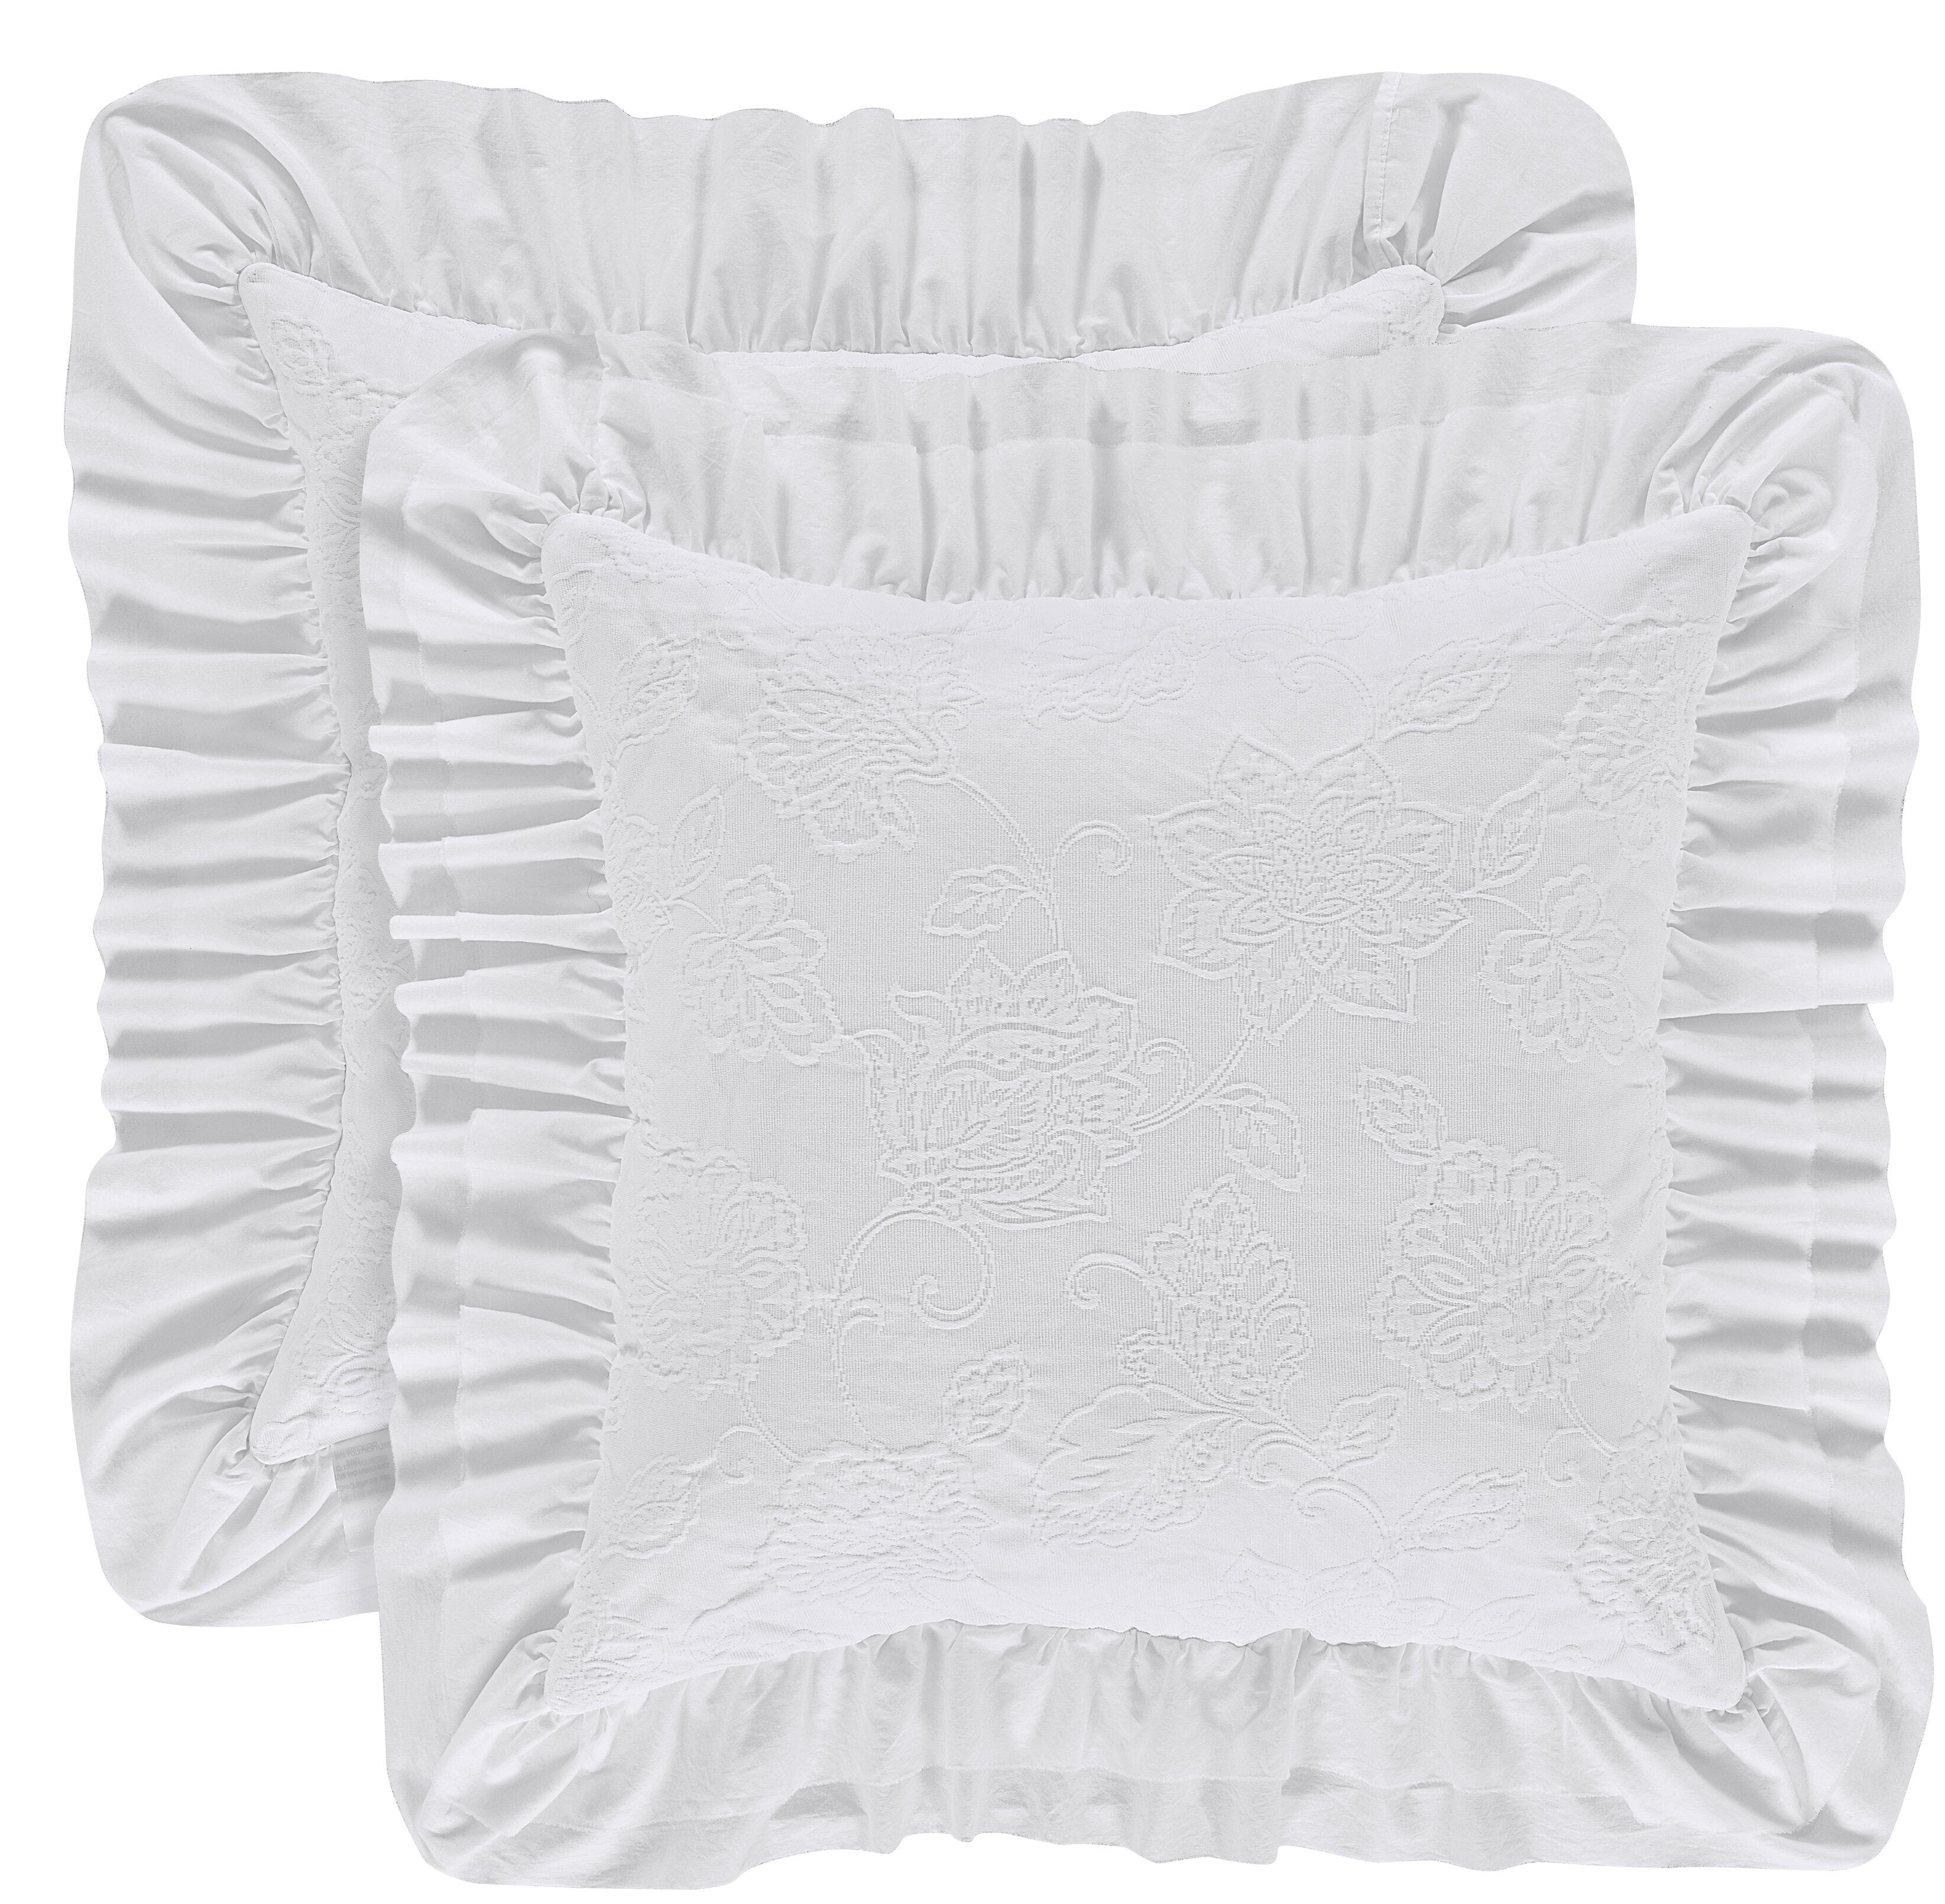 Ophelia Co Mclaughlin Square Decorative Cotton Throw Pillow Reviews Wayfair